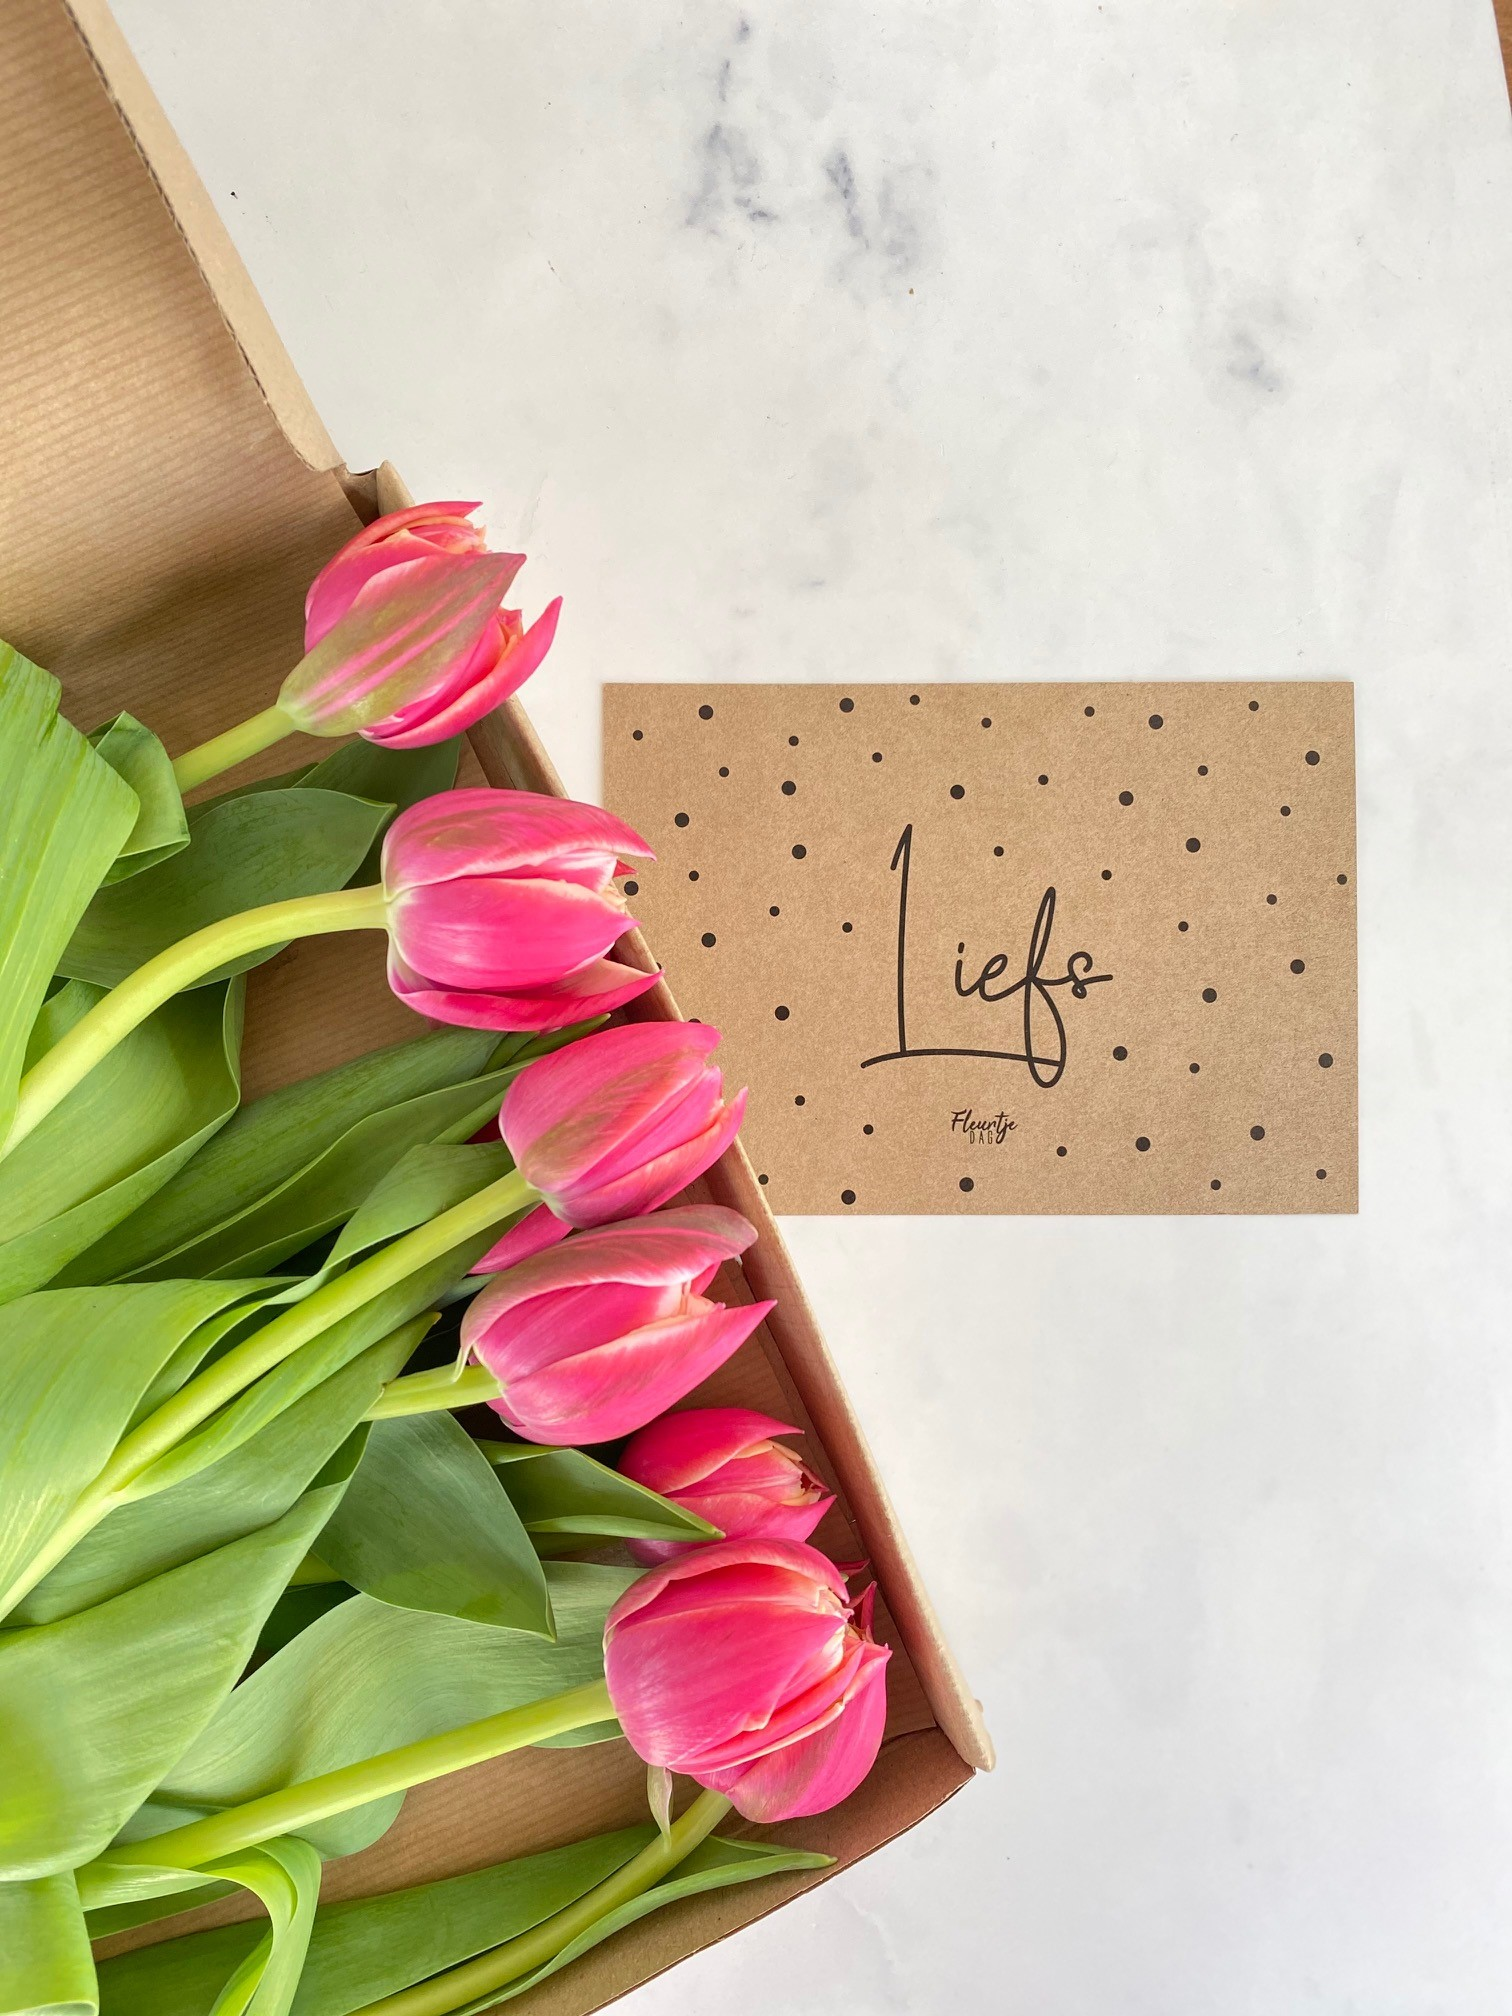 bloemen chocola tony cadeau collega secretaressedag fleurtjedag